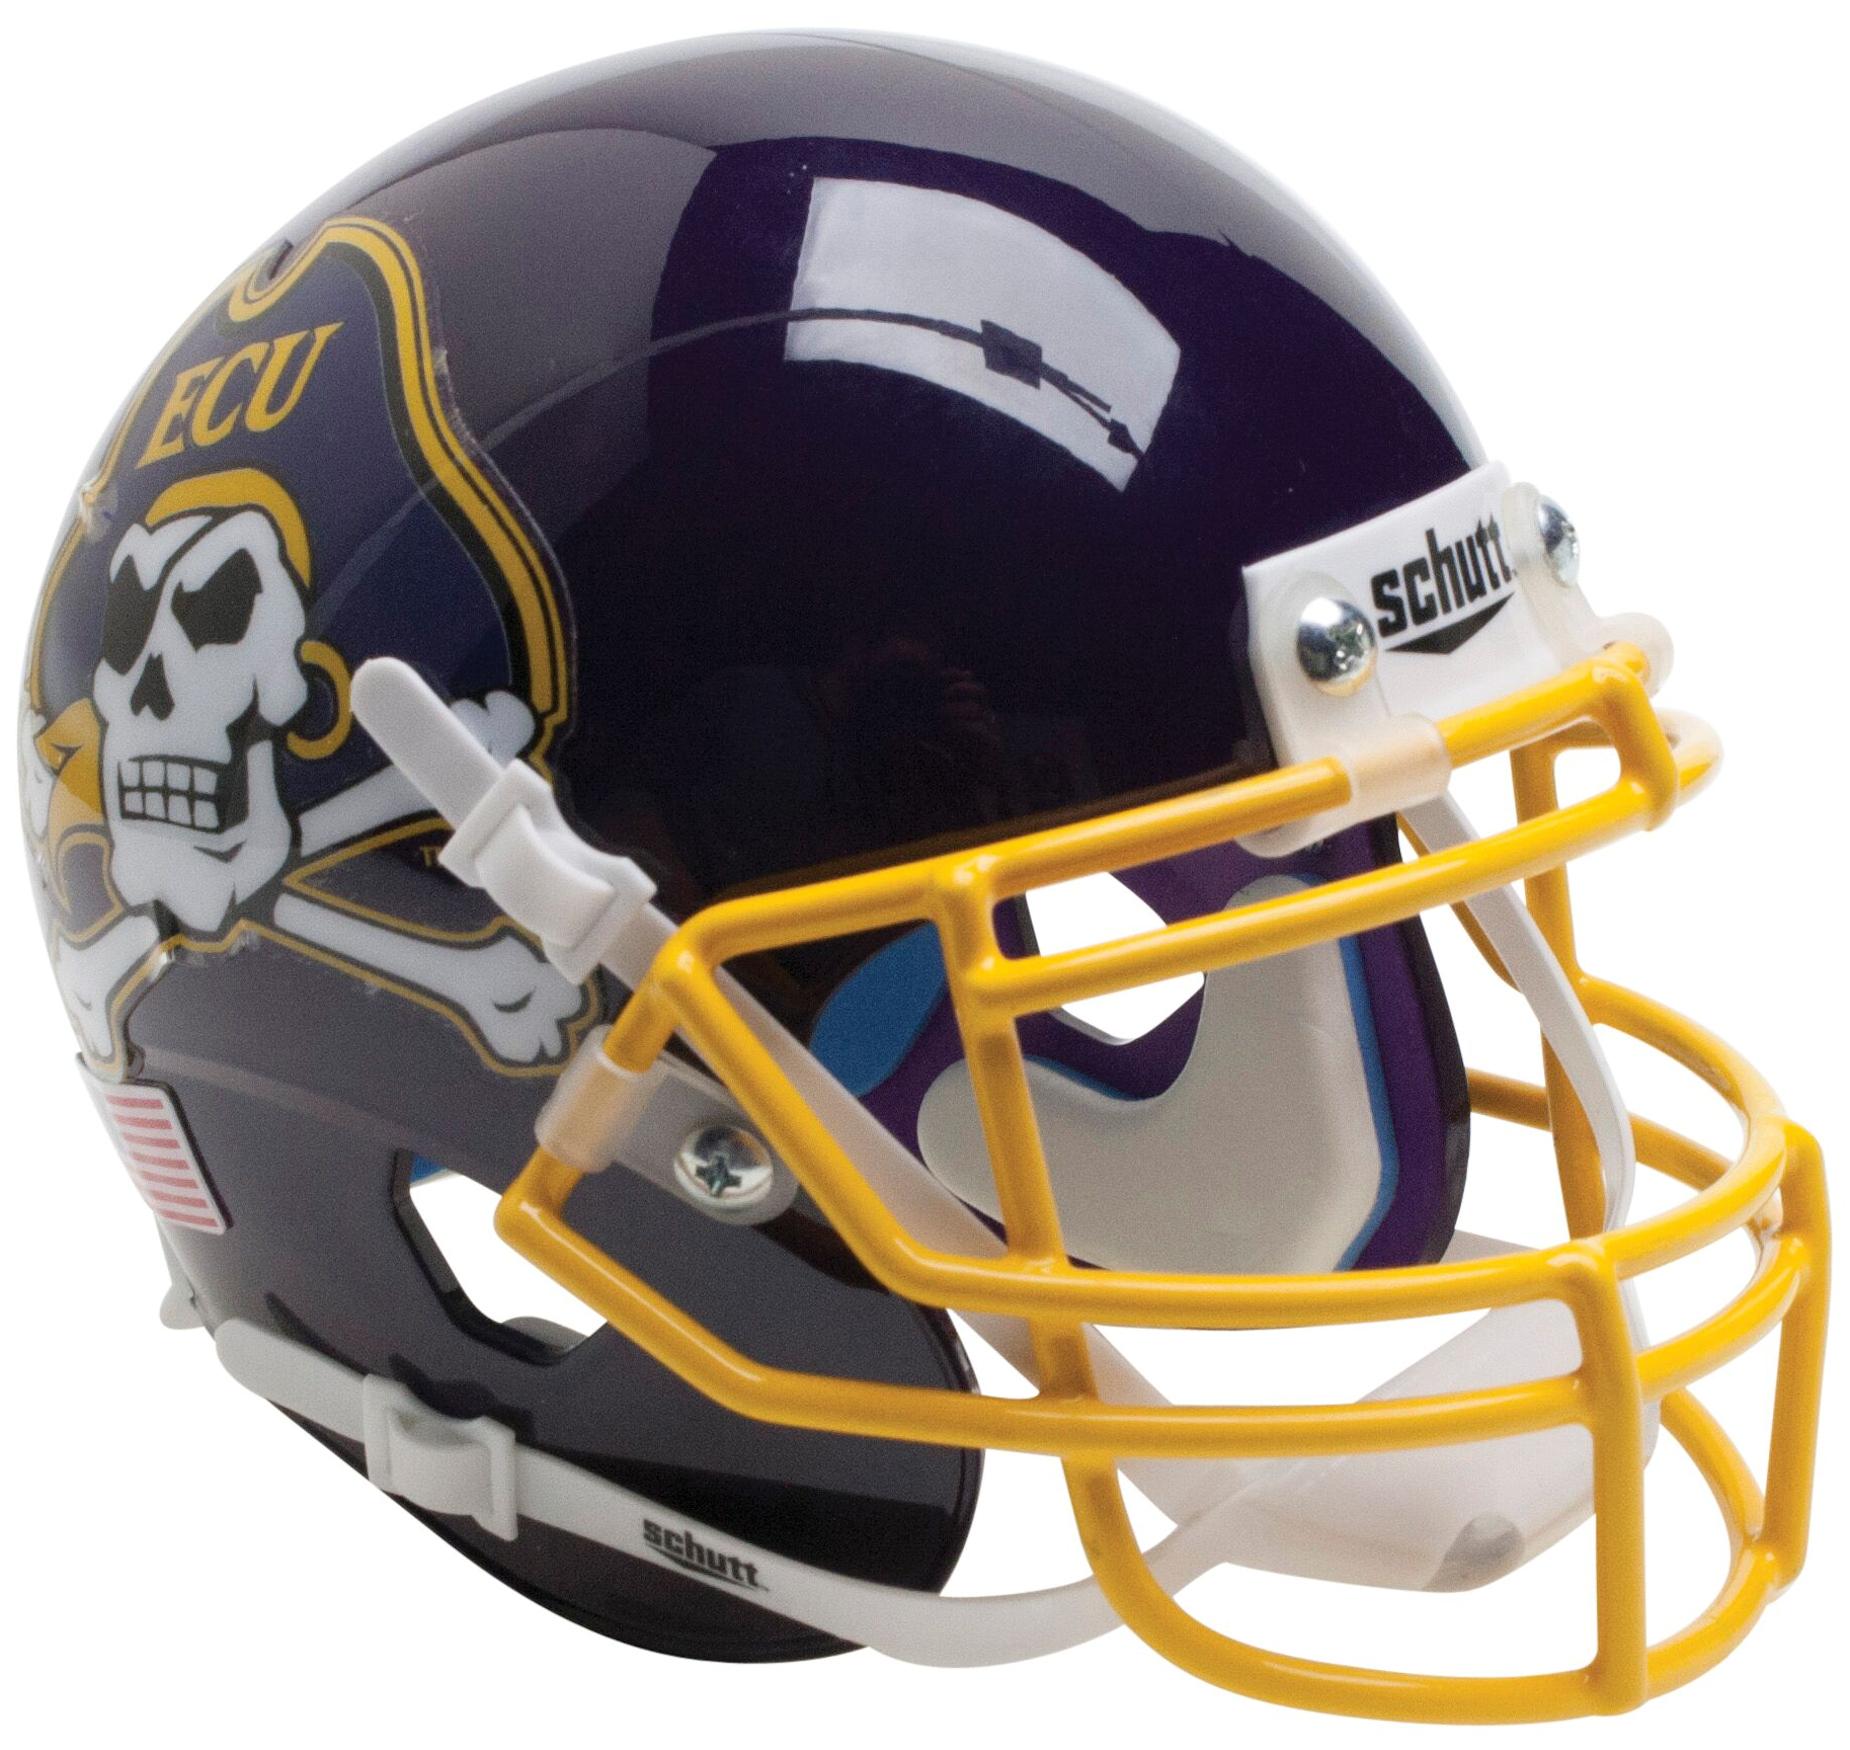 East Carolina Pirates Full XP Replica Football Helmet Schutt <B>Yellow Mask</B>